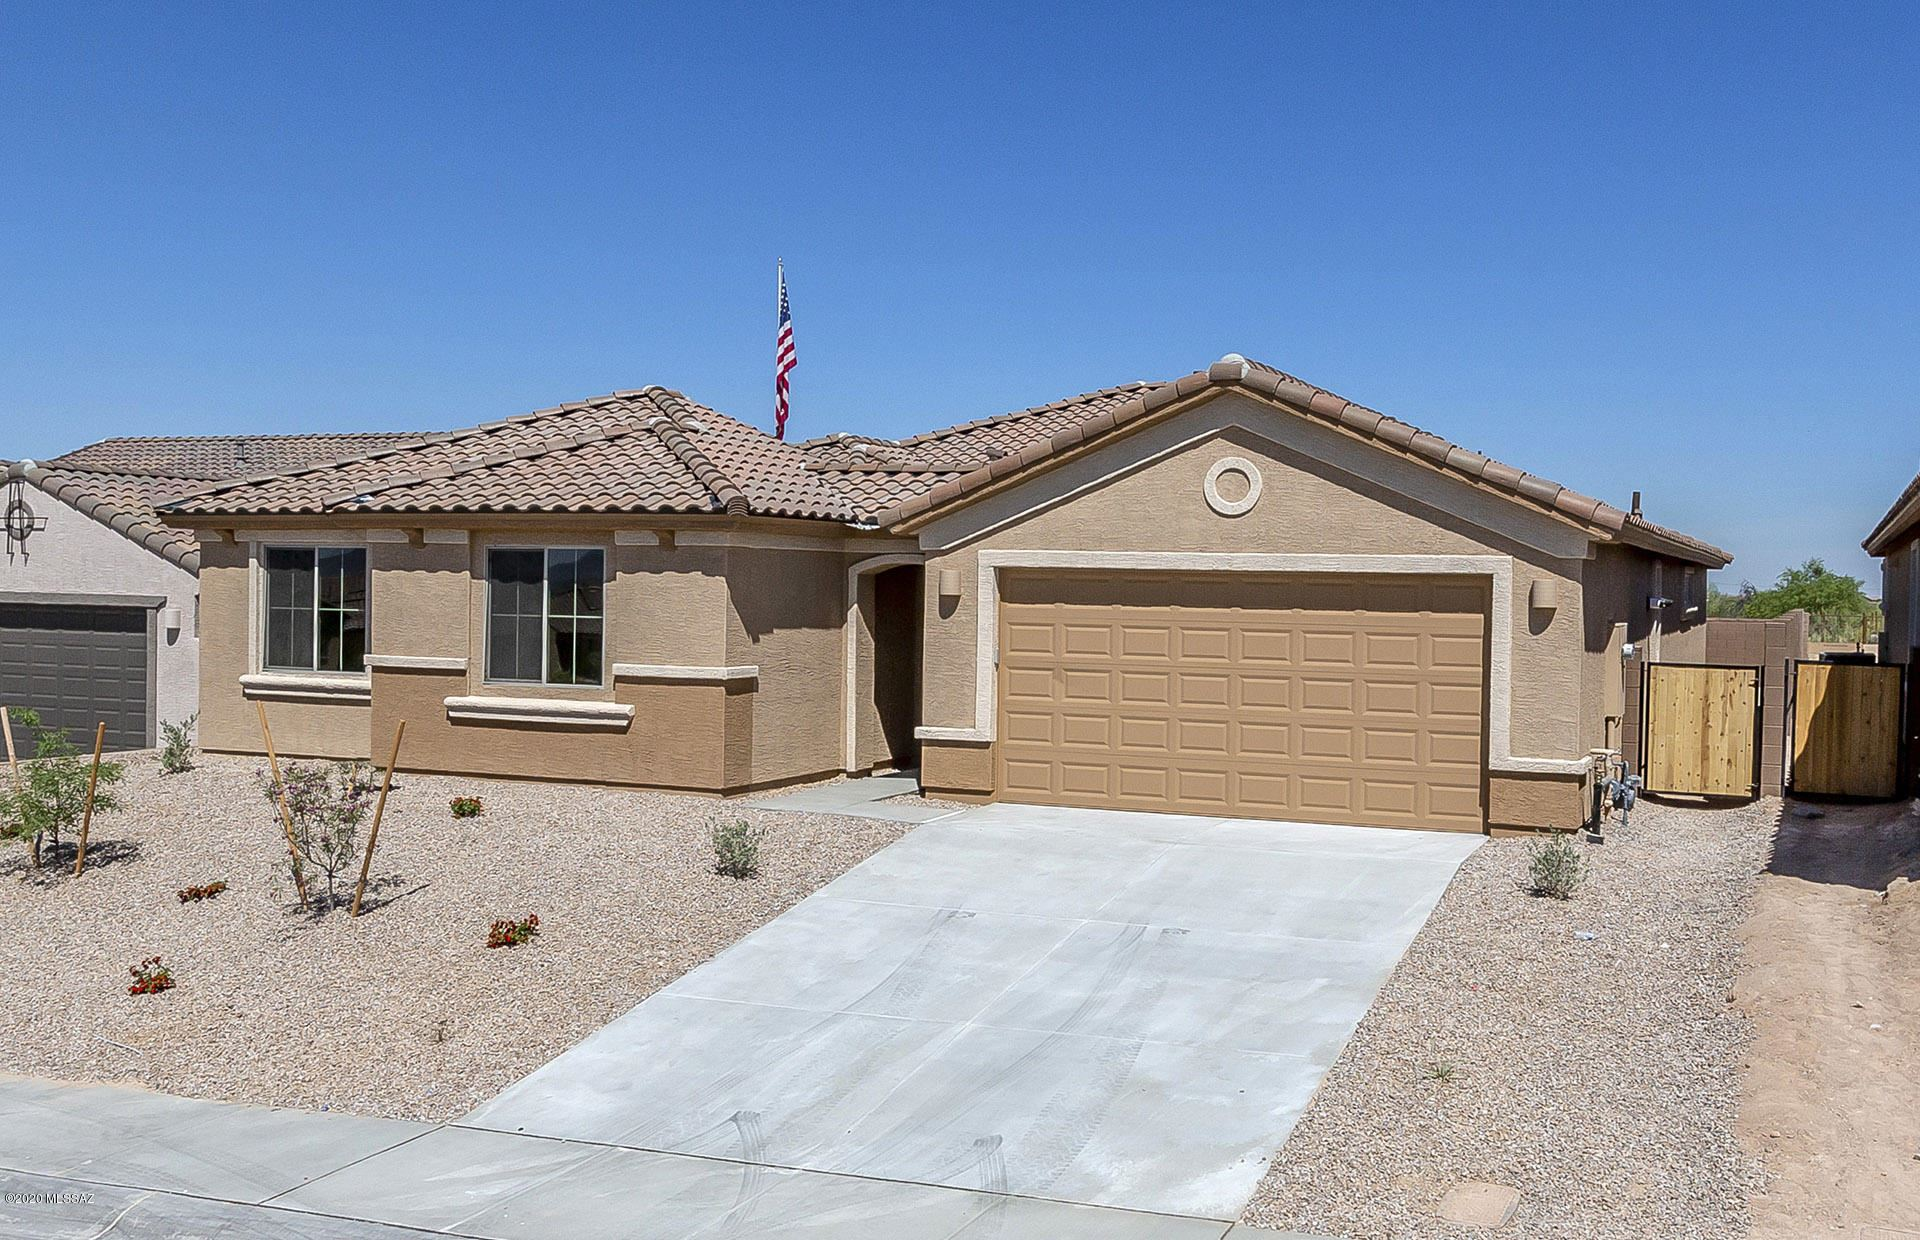 8723 N Big Ben Lane, Tucson, AZ 85742 - #: 22002919